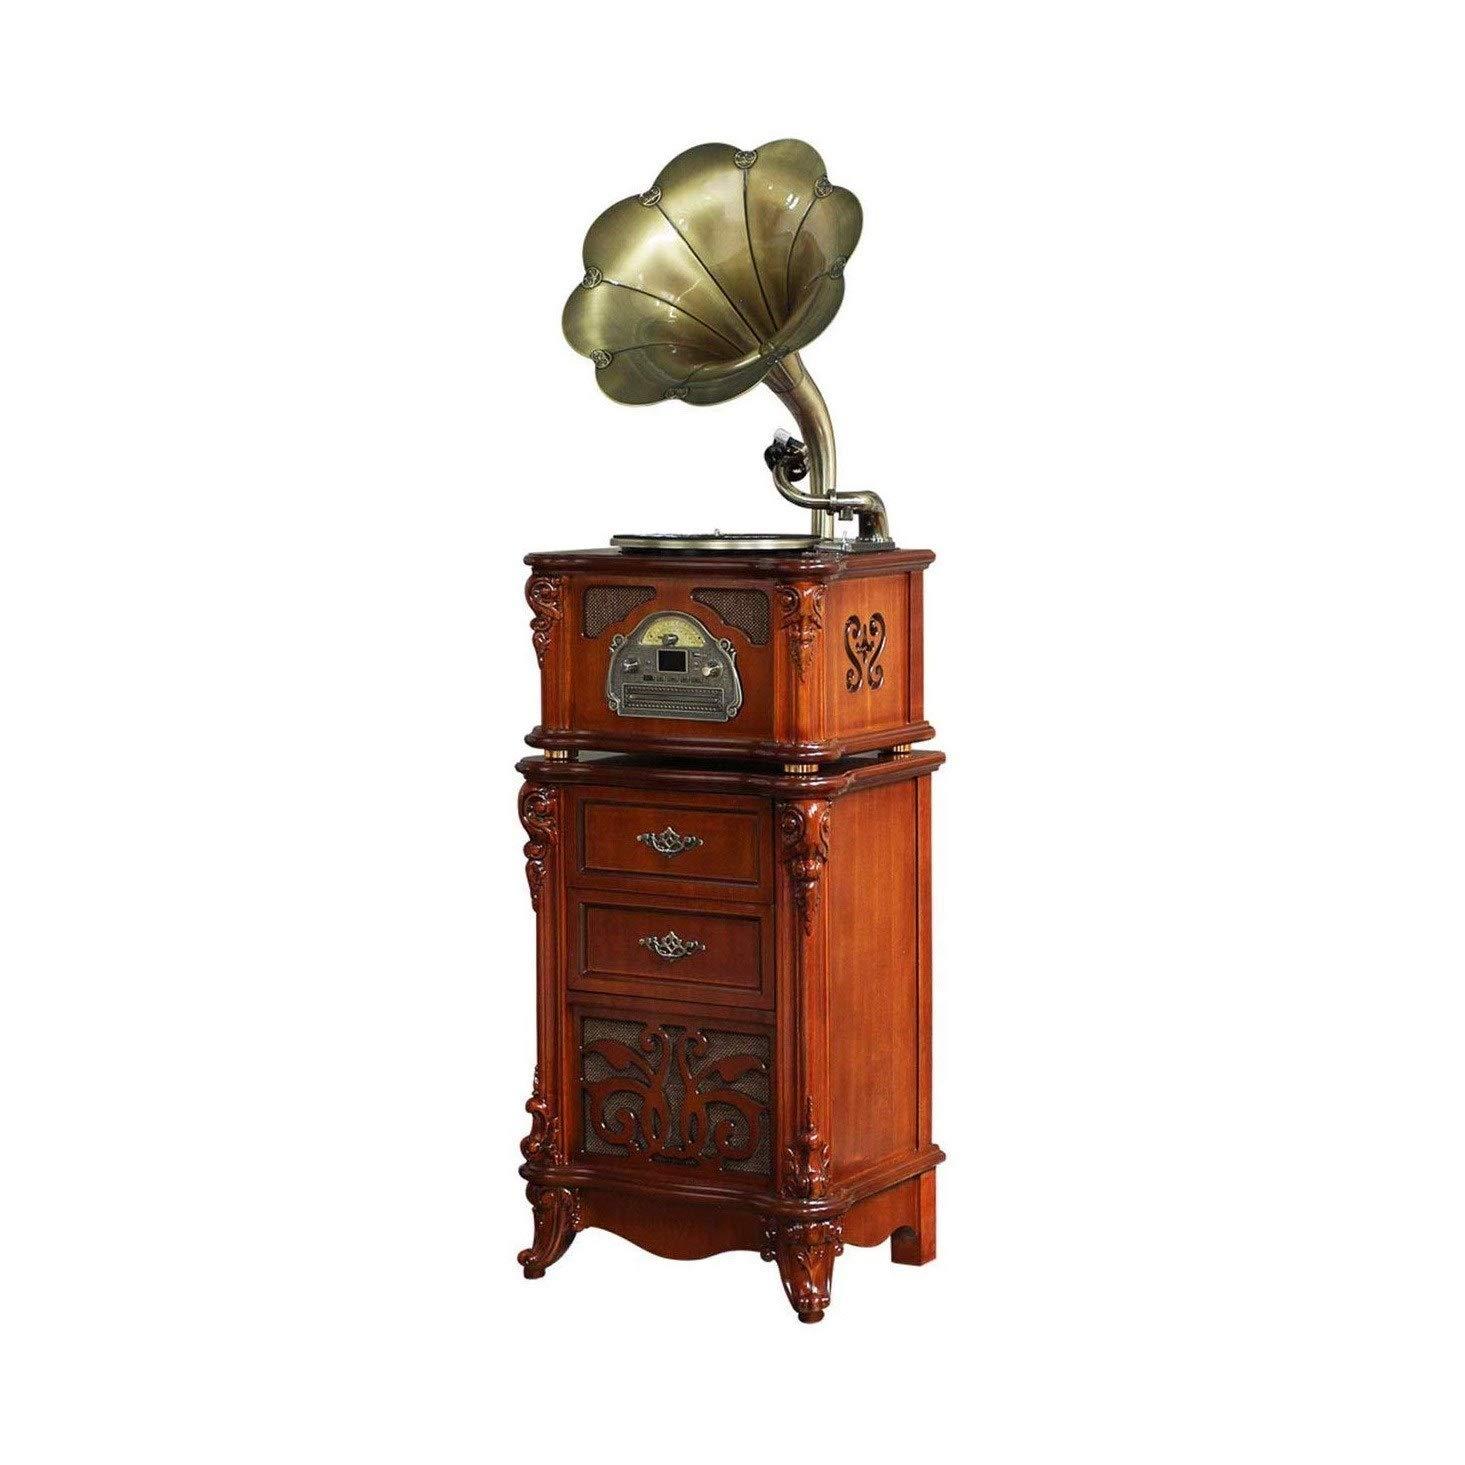 TBTUA Gramophone Speaker,Portable Wireless Retro Speaker,Louder,Stereo,Longer Playtime,Built-in Mic Compatible Wood Old…